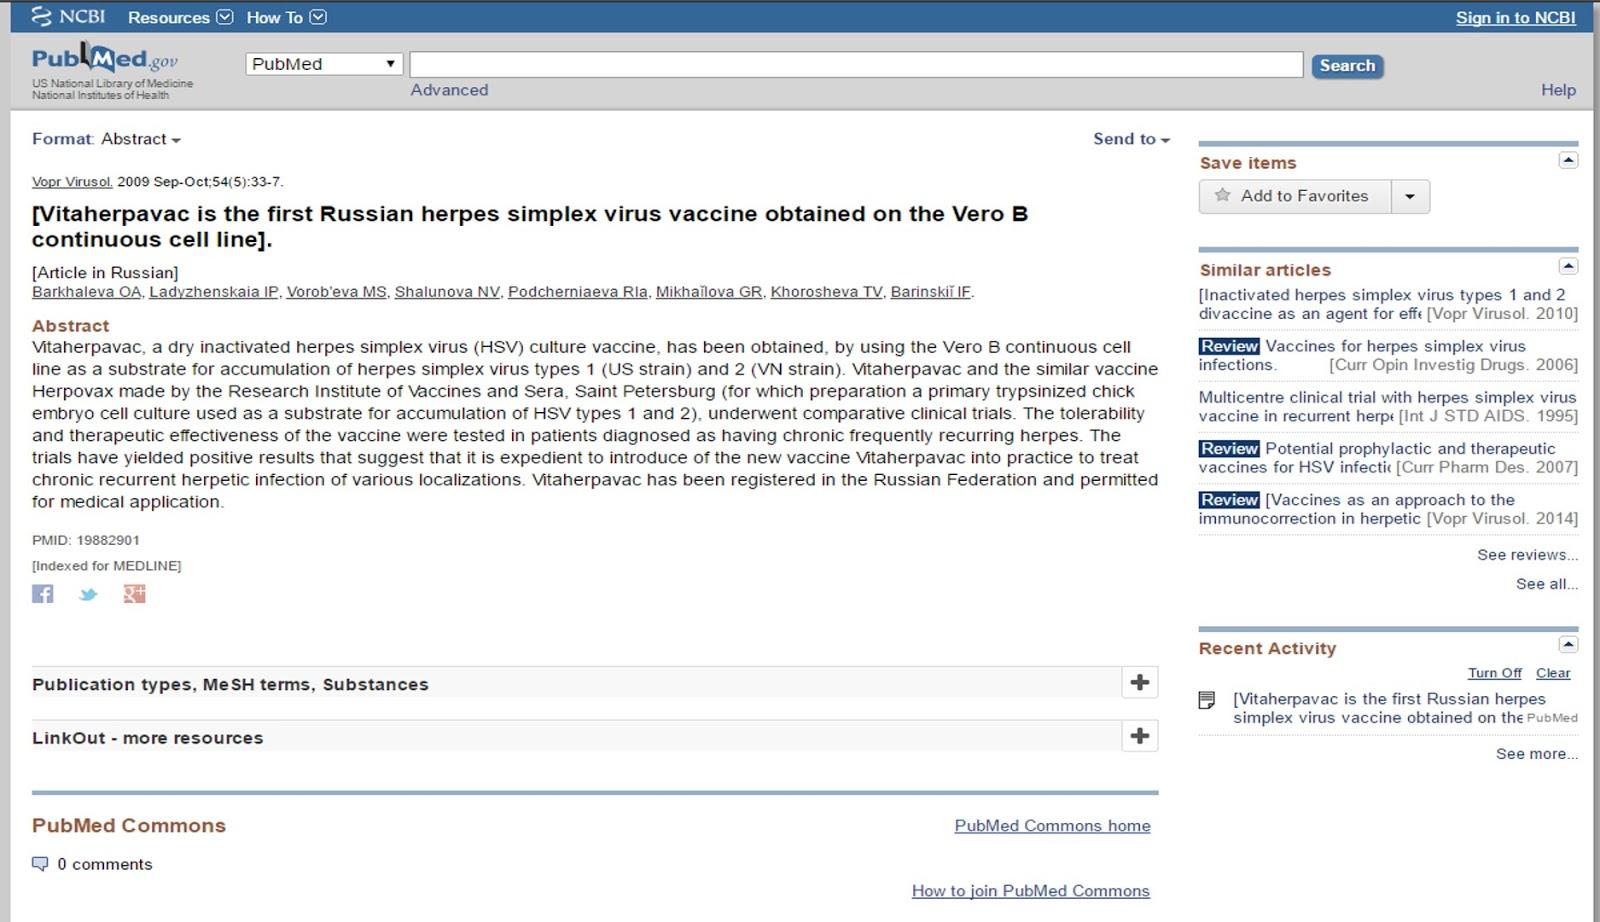 House of Herpesians: Vitaherpavac- Russian Vaccine?